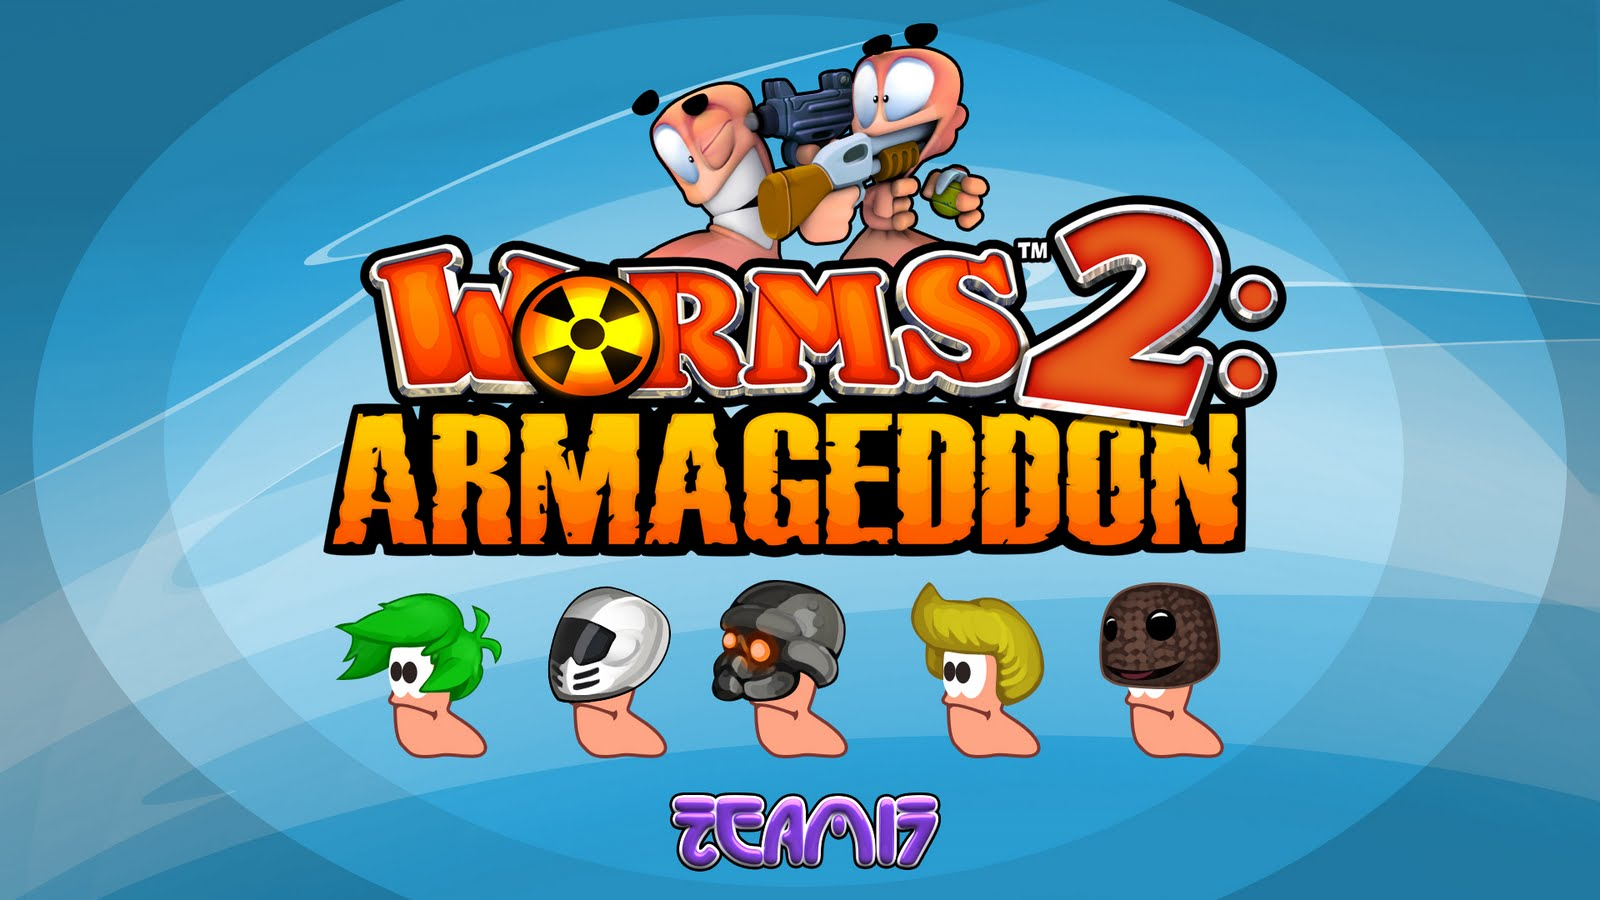 http://3.bp.blogspot.com/_dzJVCMGZIBE/TIfxHMHhlVI/AAAAAAABAS4/d33gYxWHWsE/s1600/Worms_2_Armageddon_Sony_hats.jpg